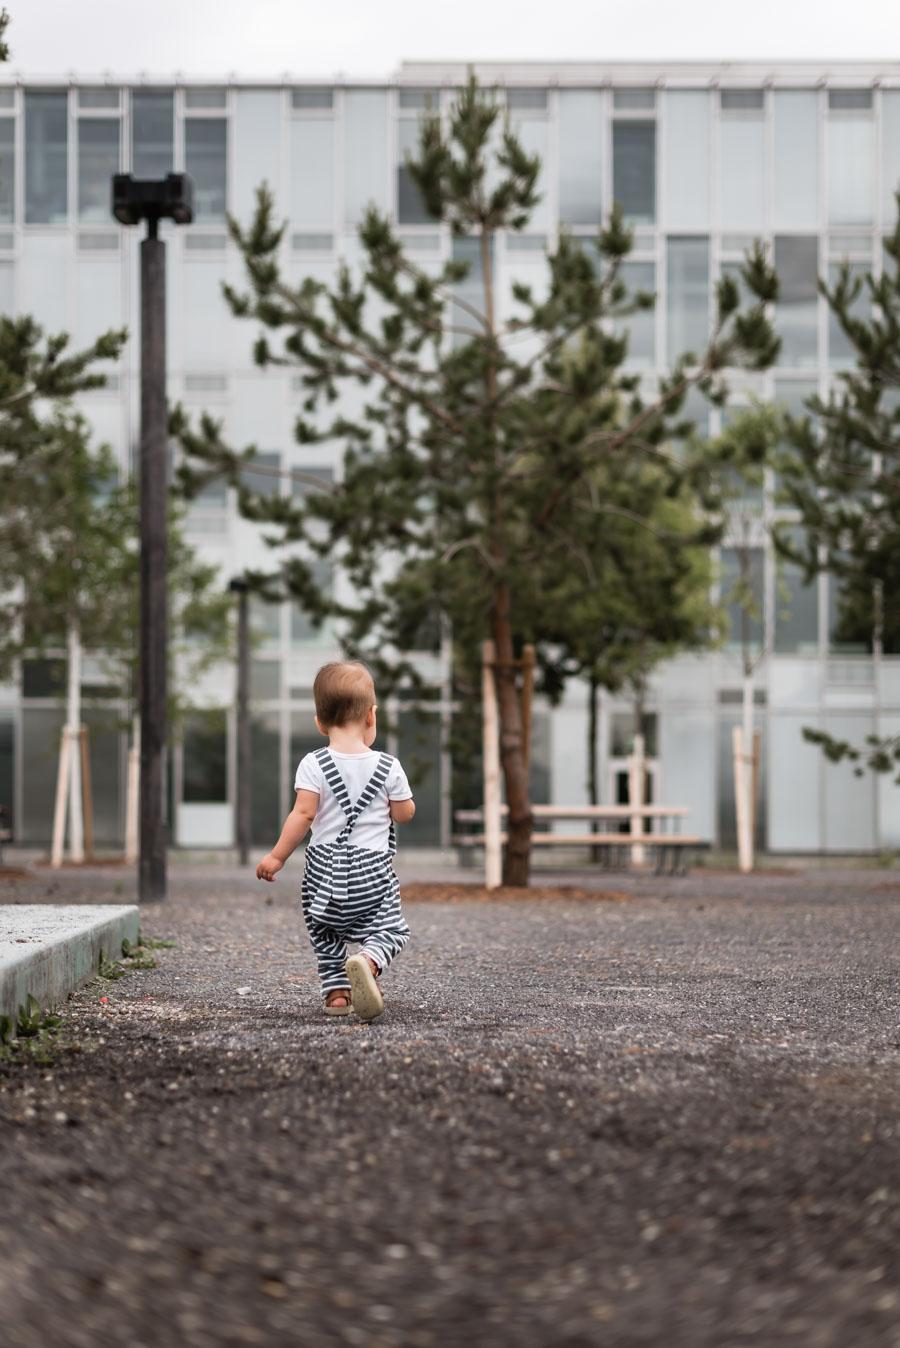 Toddler walks through the park / Copyright Isabelle Kade